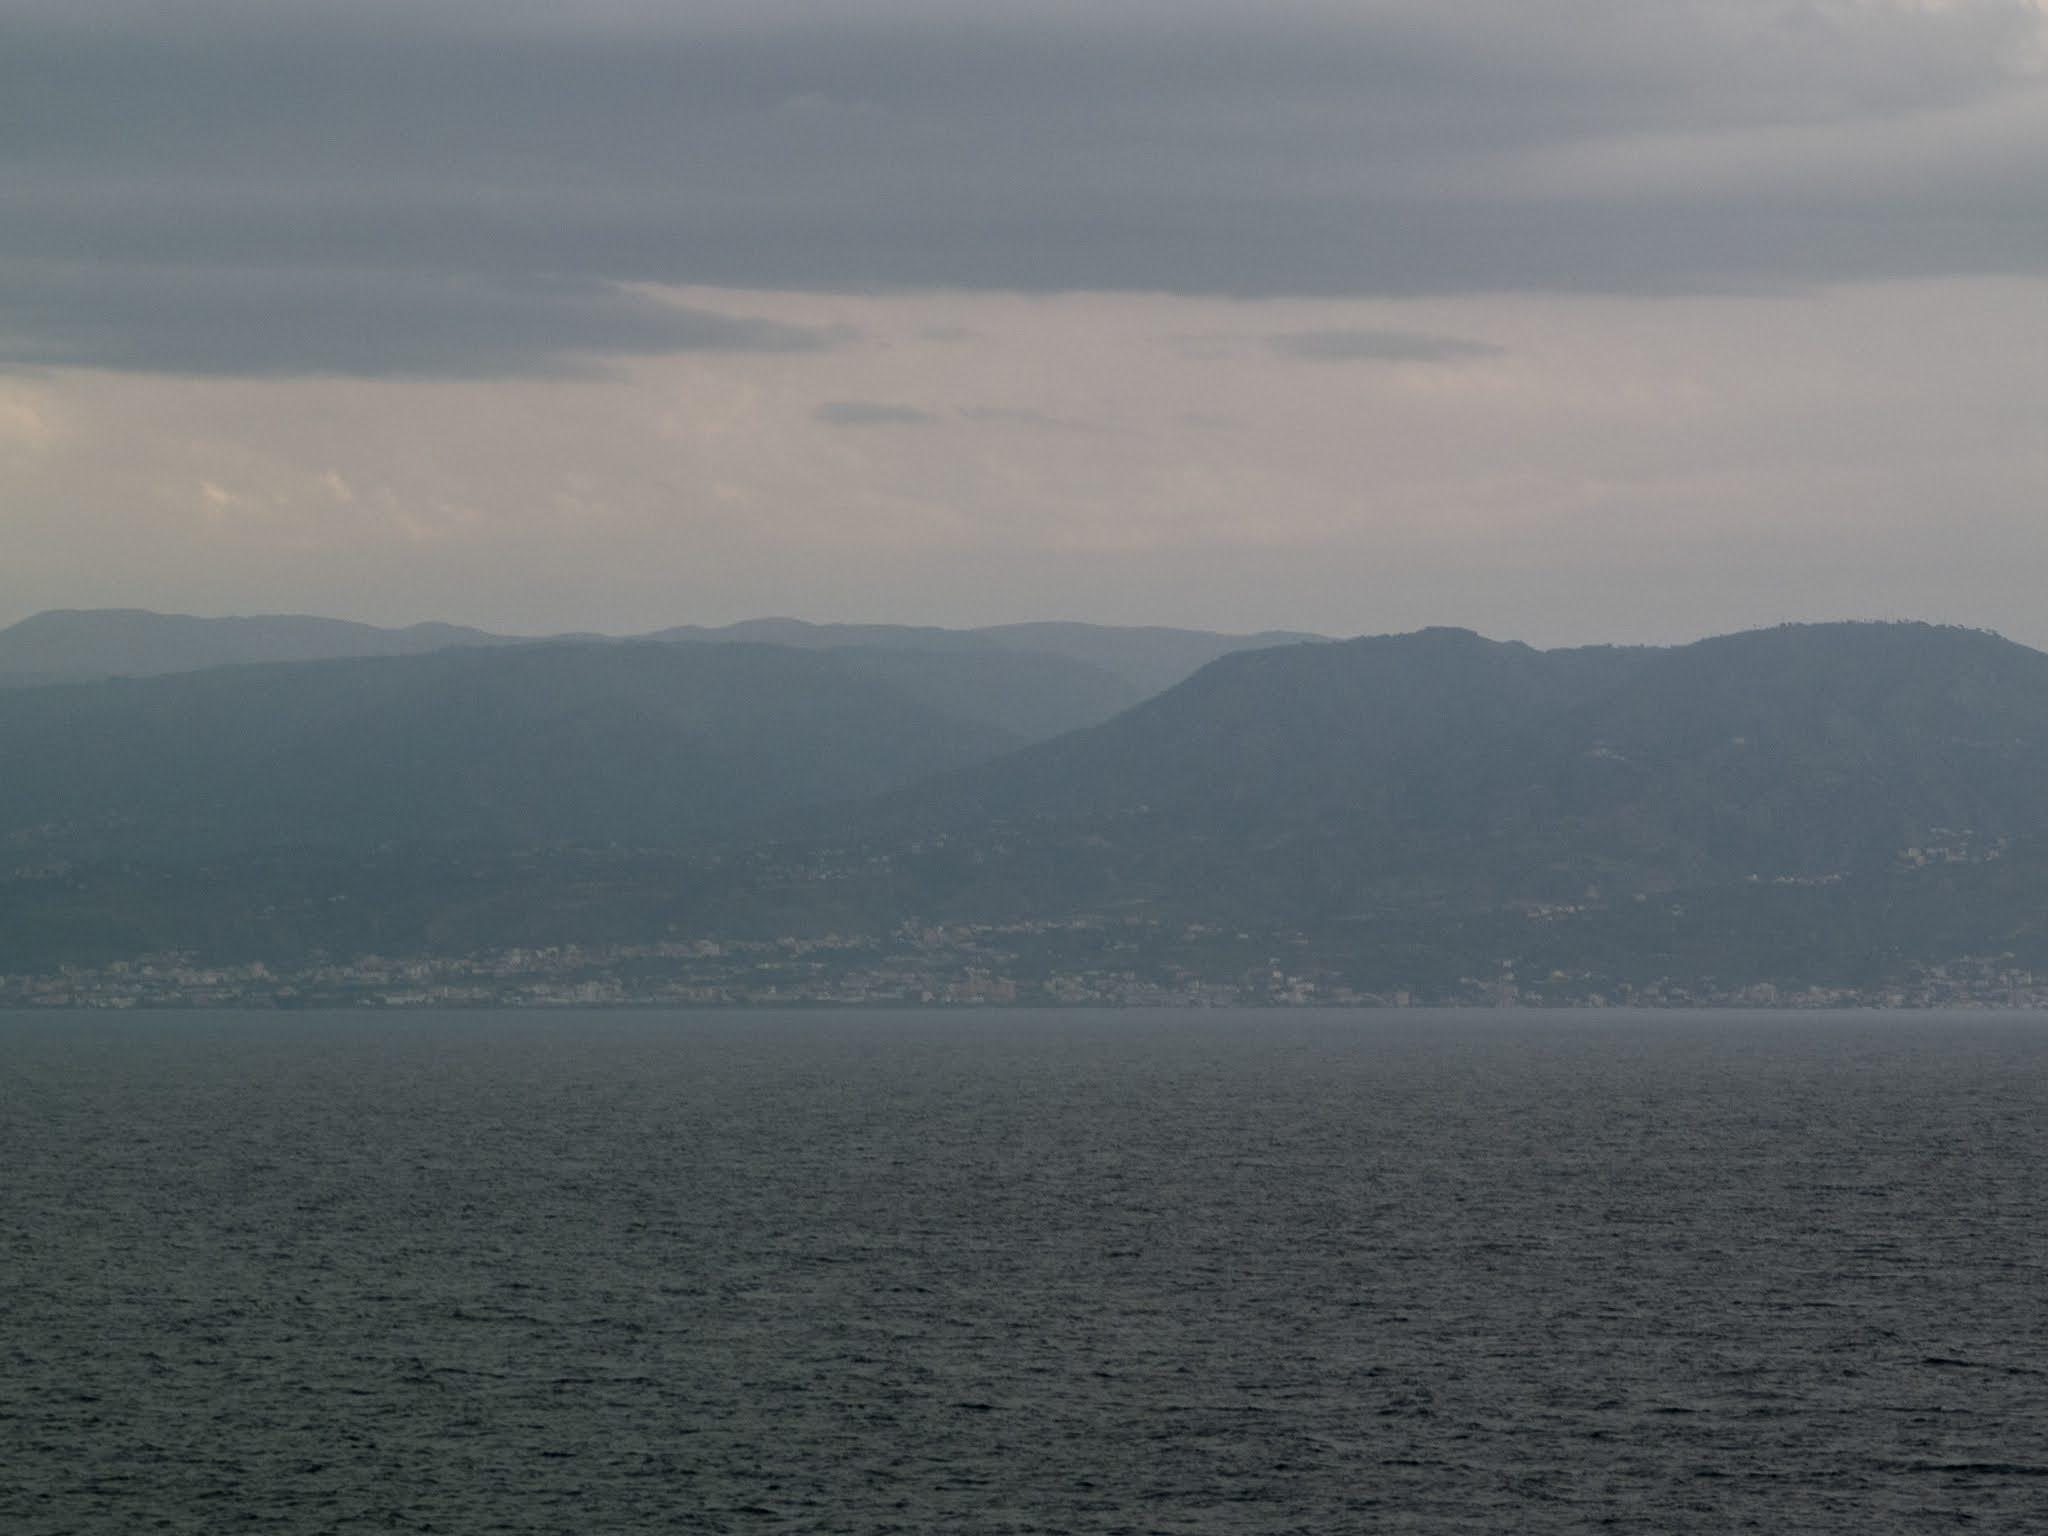 Mountain landscape on the coast of the Mediterranean sea.